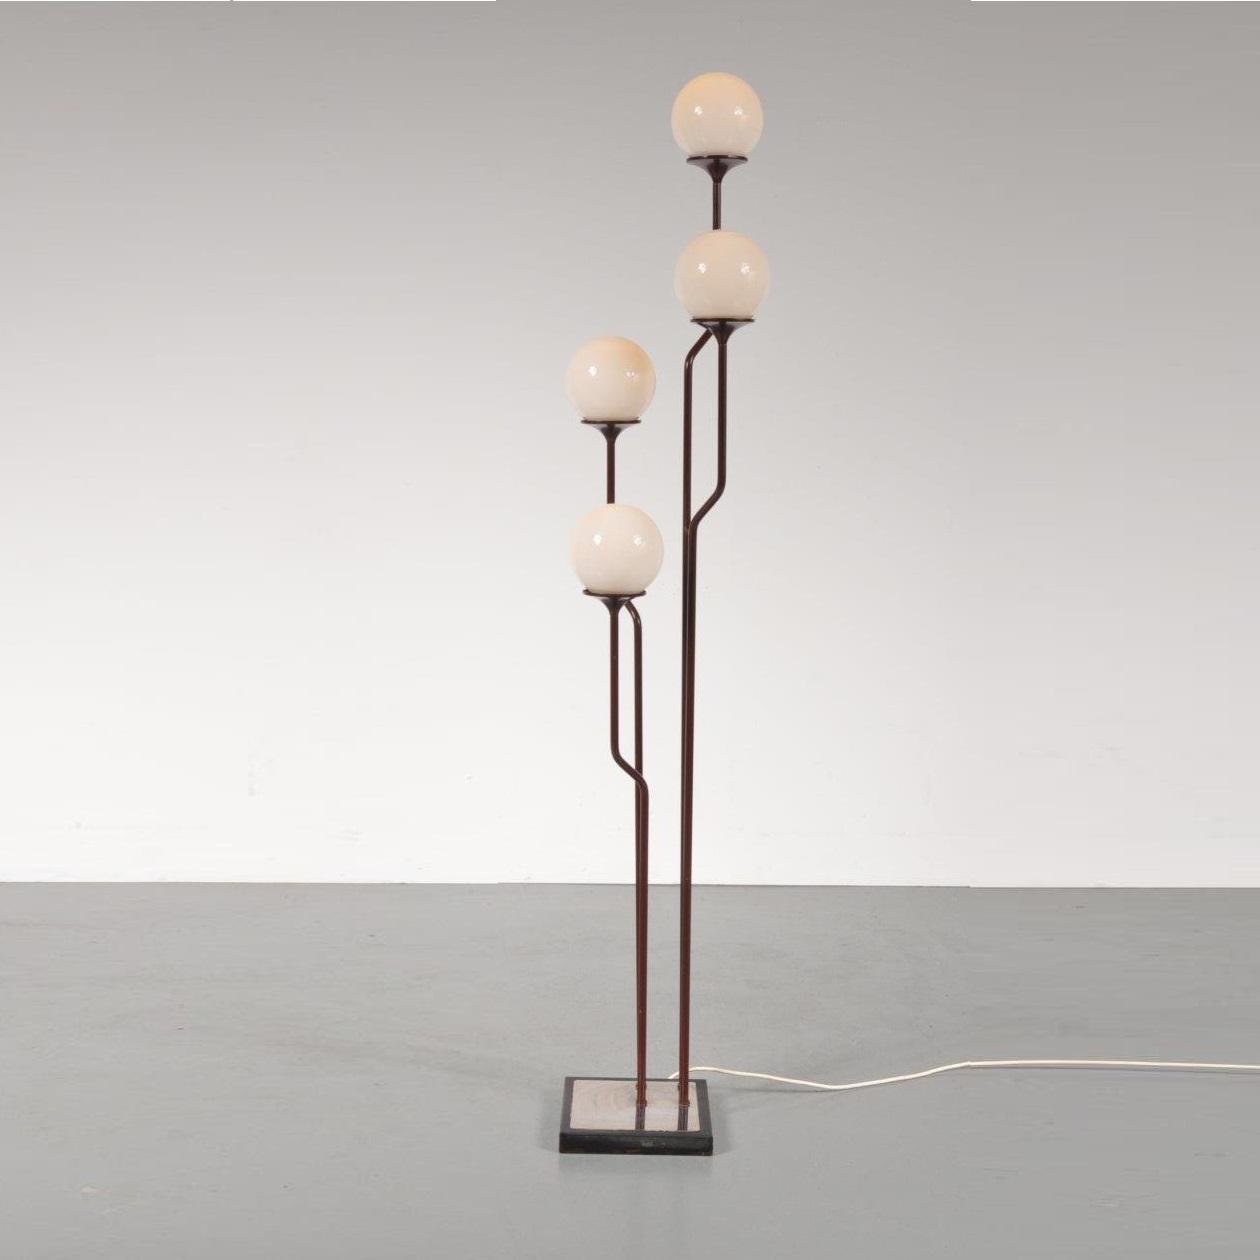 1960s Floor lamp by Goffredo Reggiani, Italy